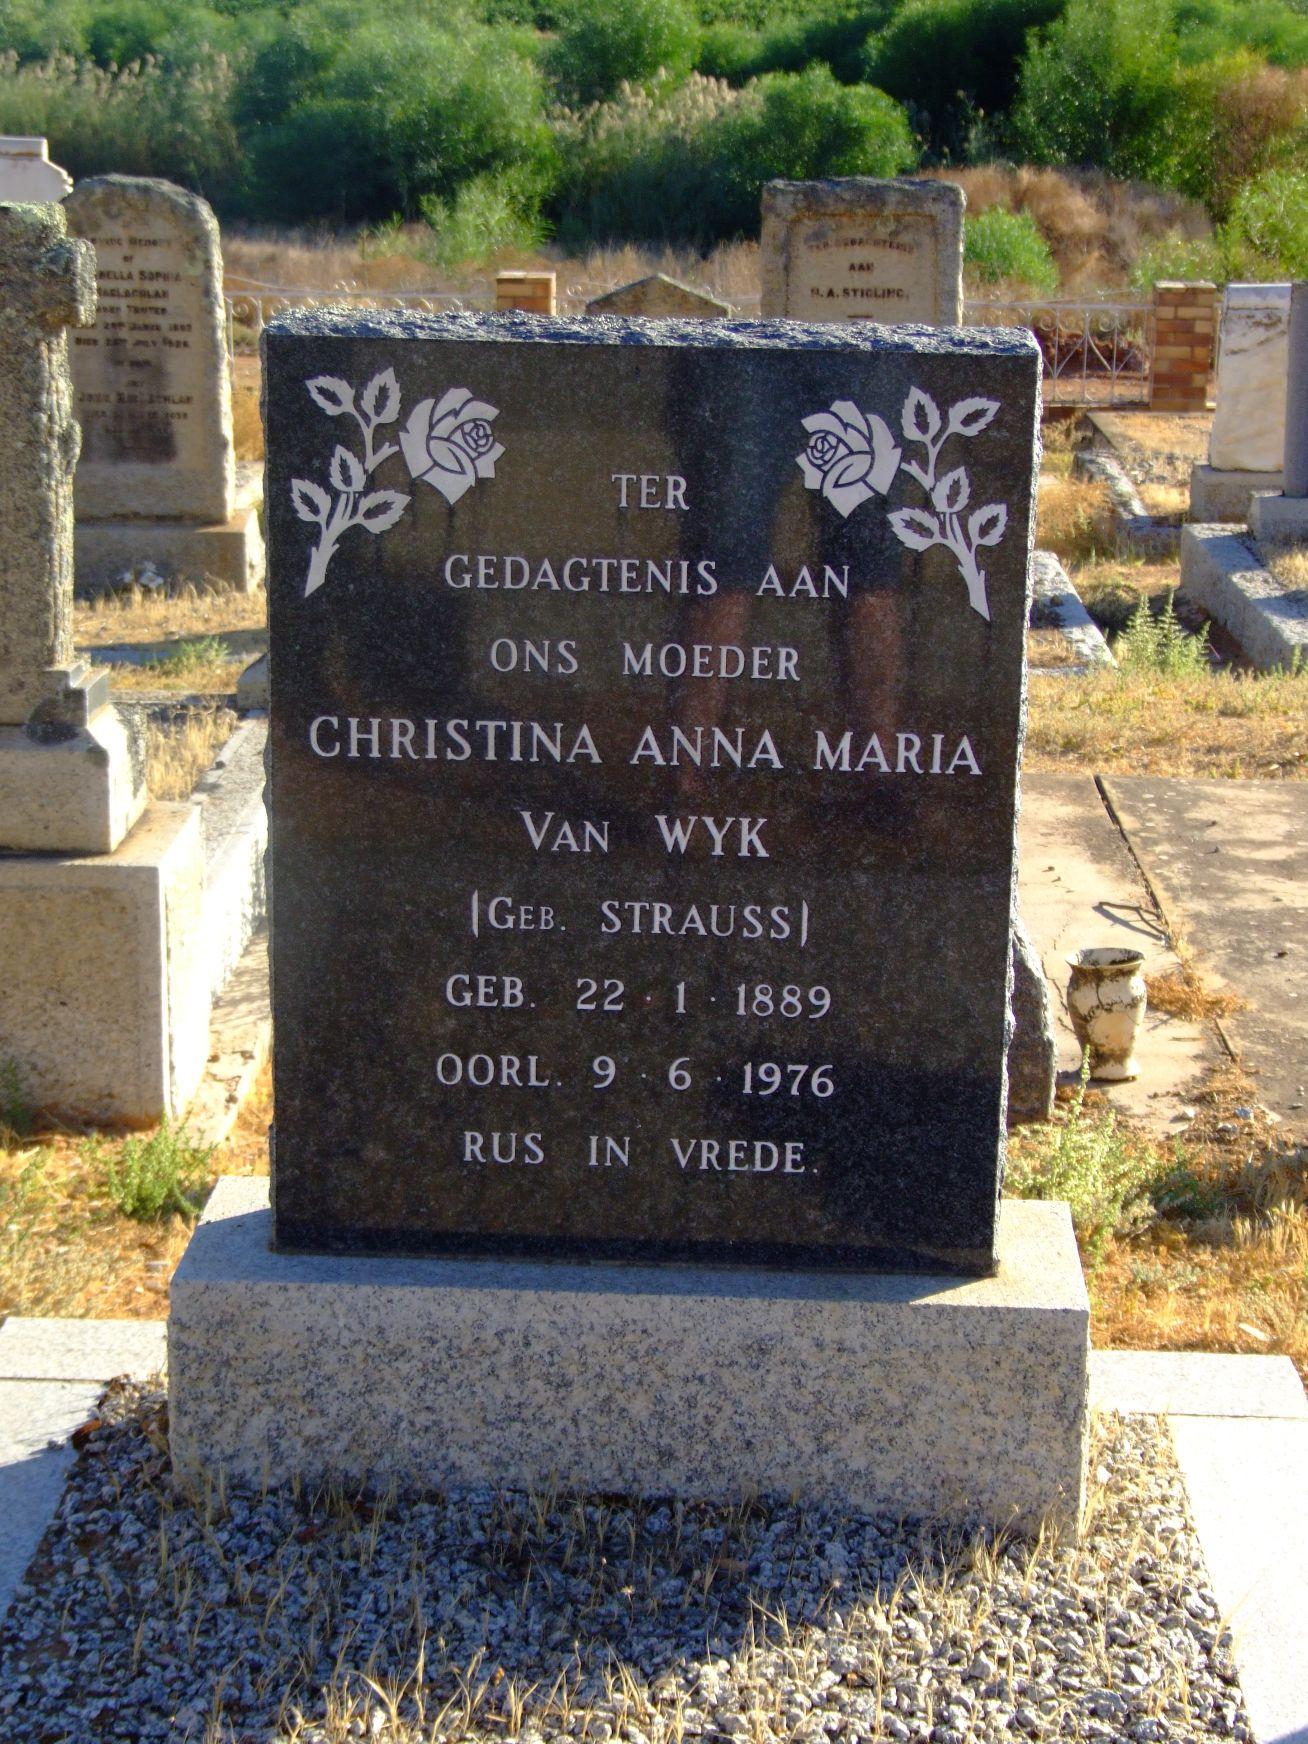 Van Wyk, Christina Anna Maria